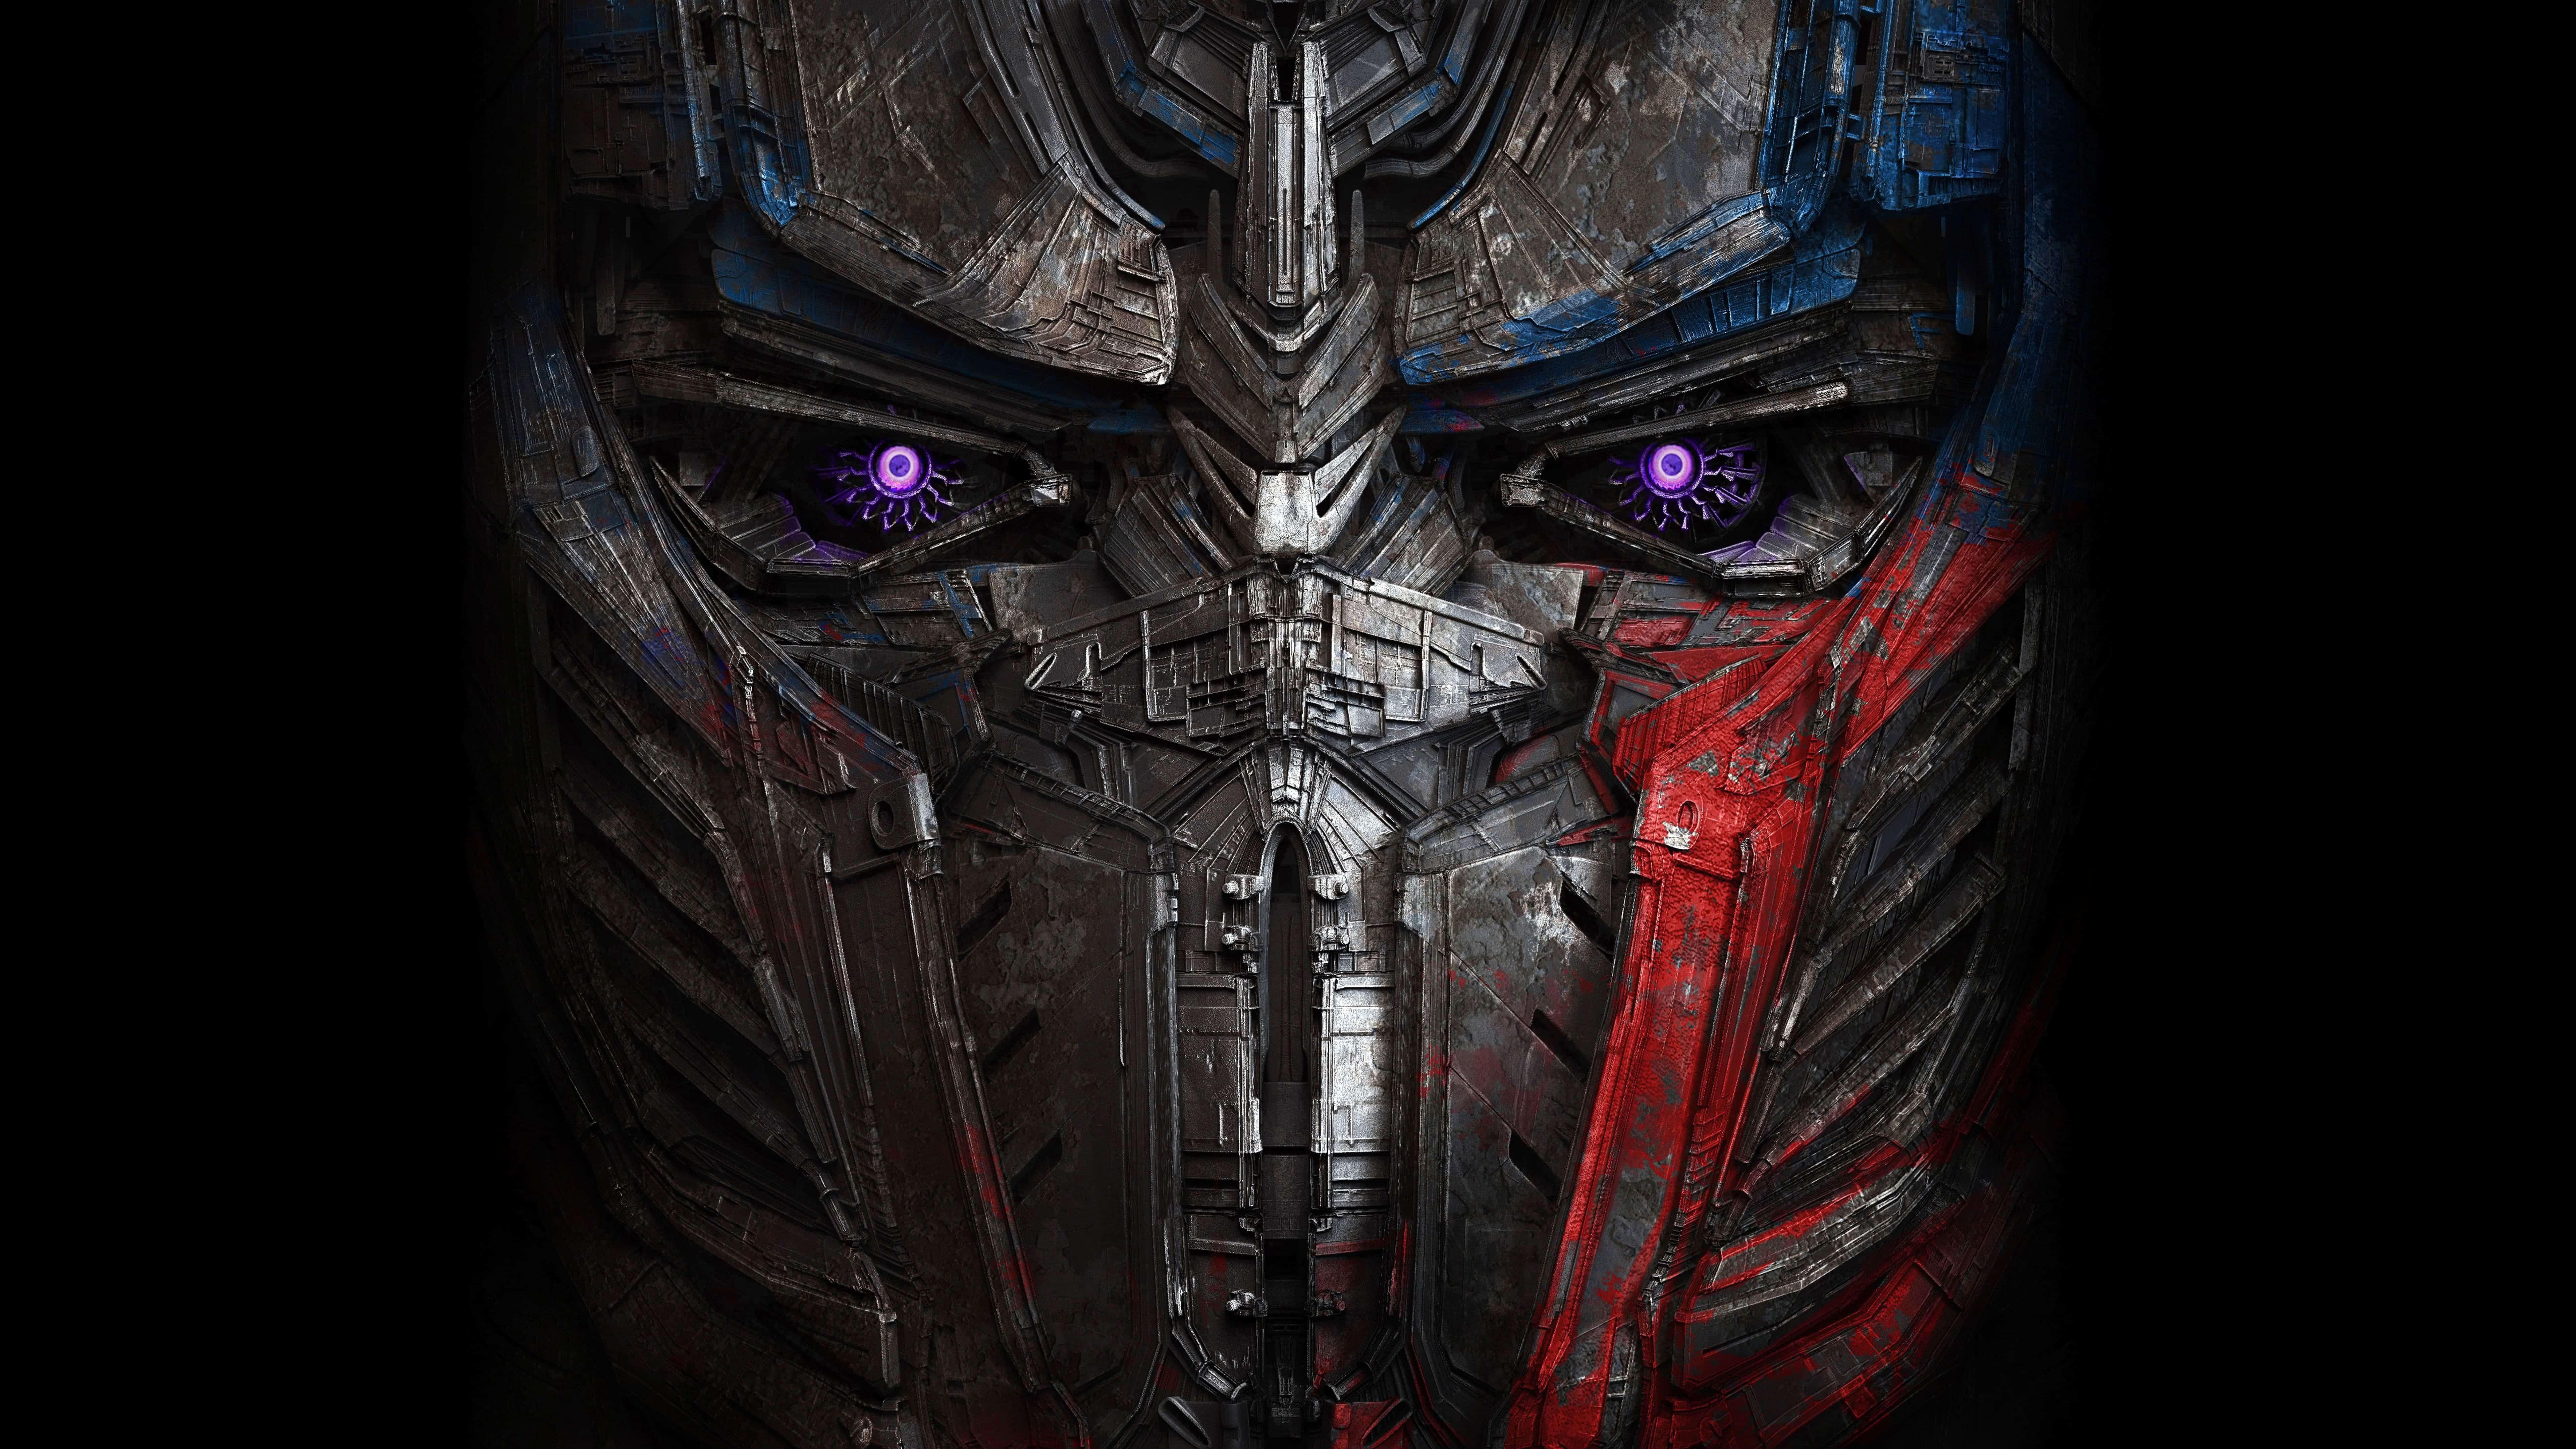 transformers 5 the last knight uhd 8k wallpaper